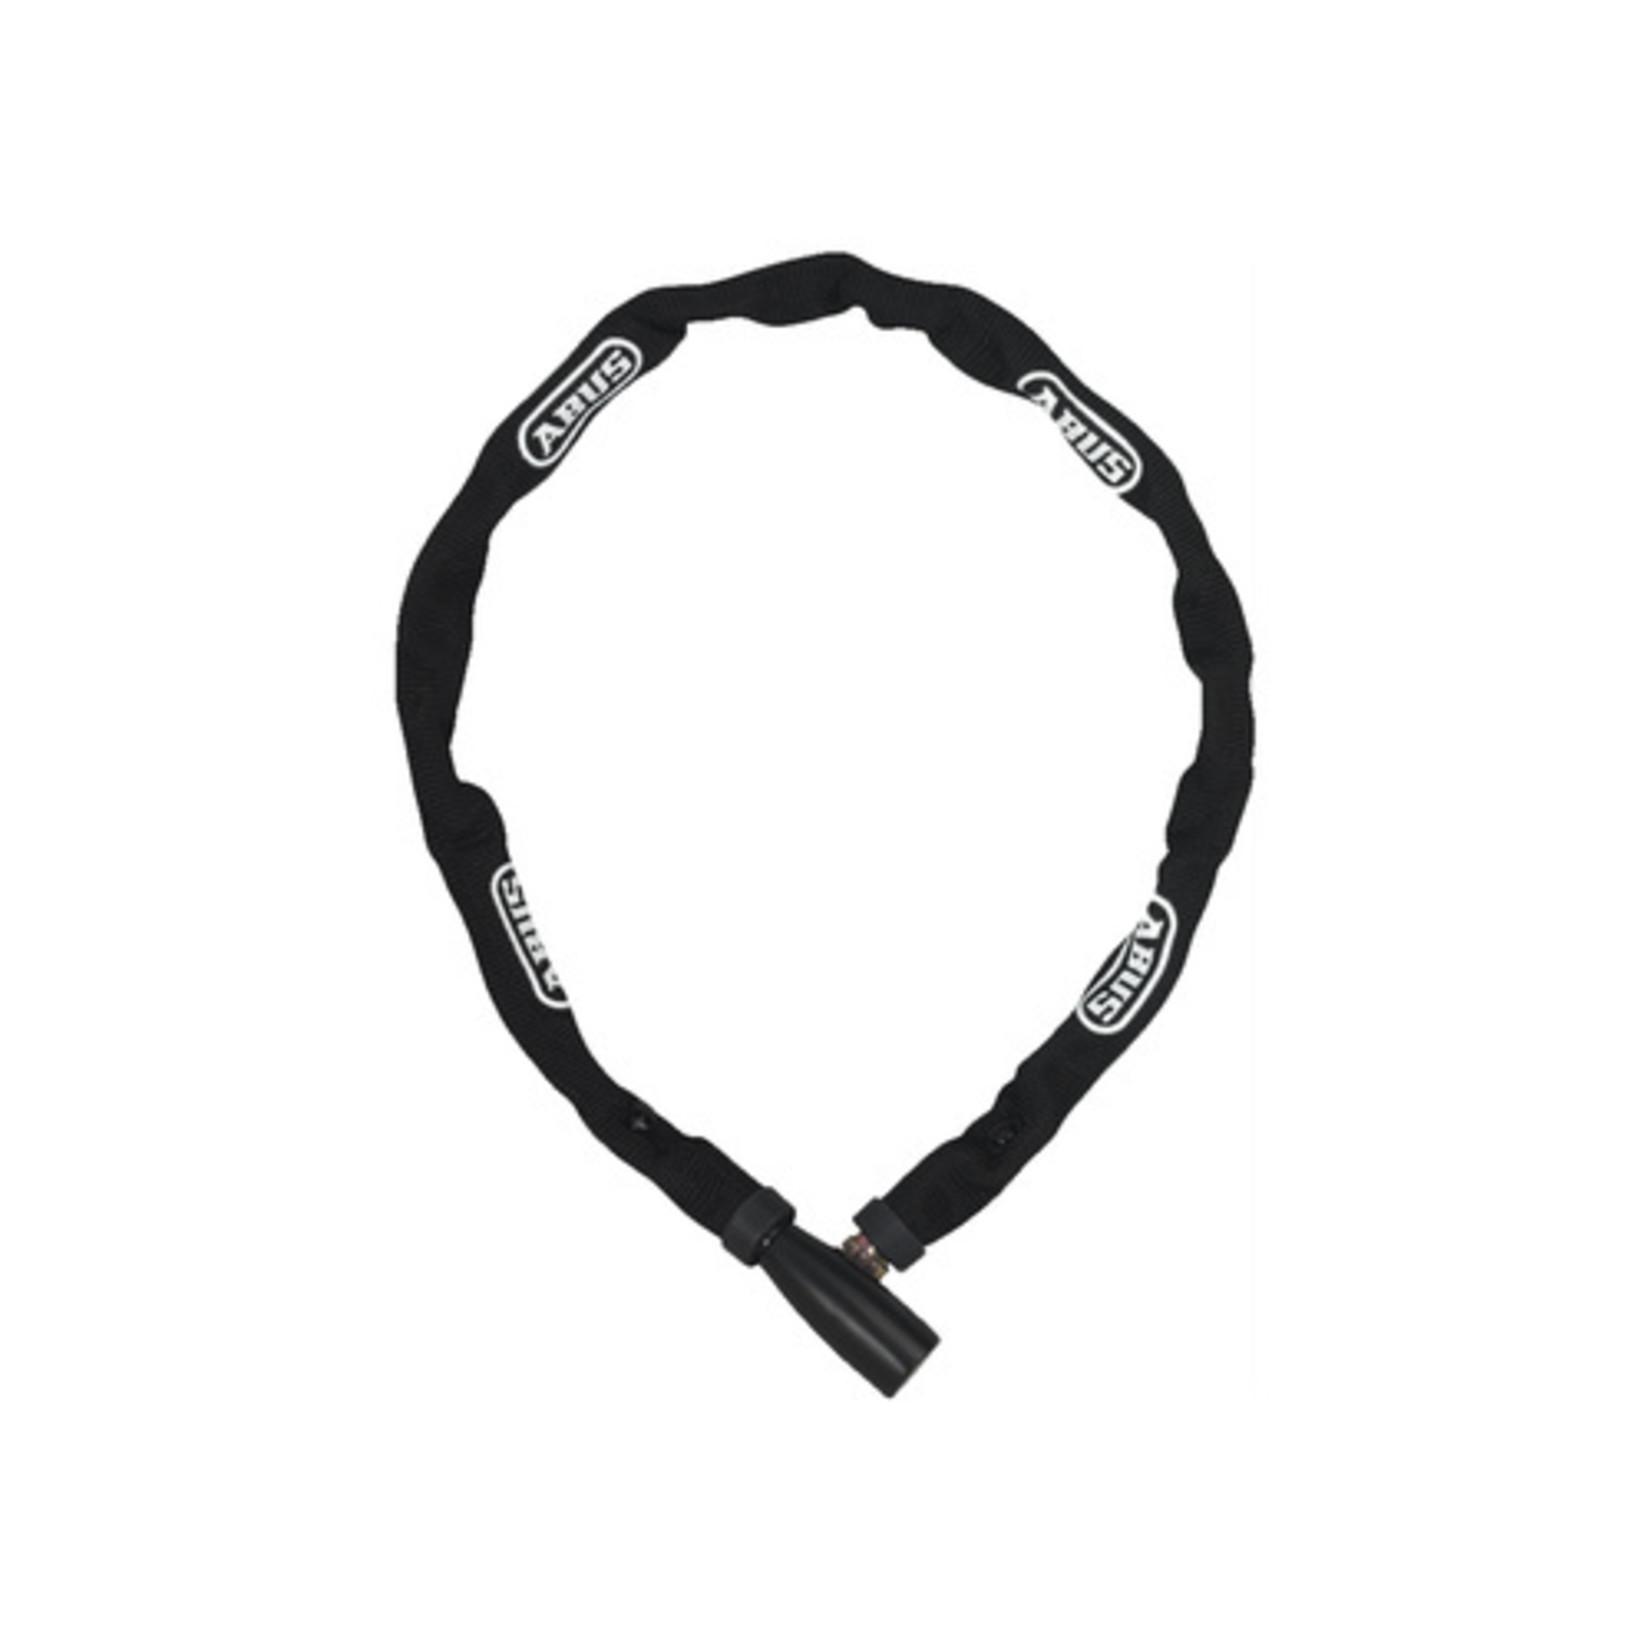 Abus Abus, Lock Chain 1500 Web 110cm Black